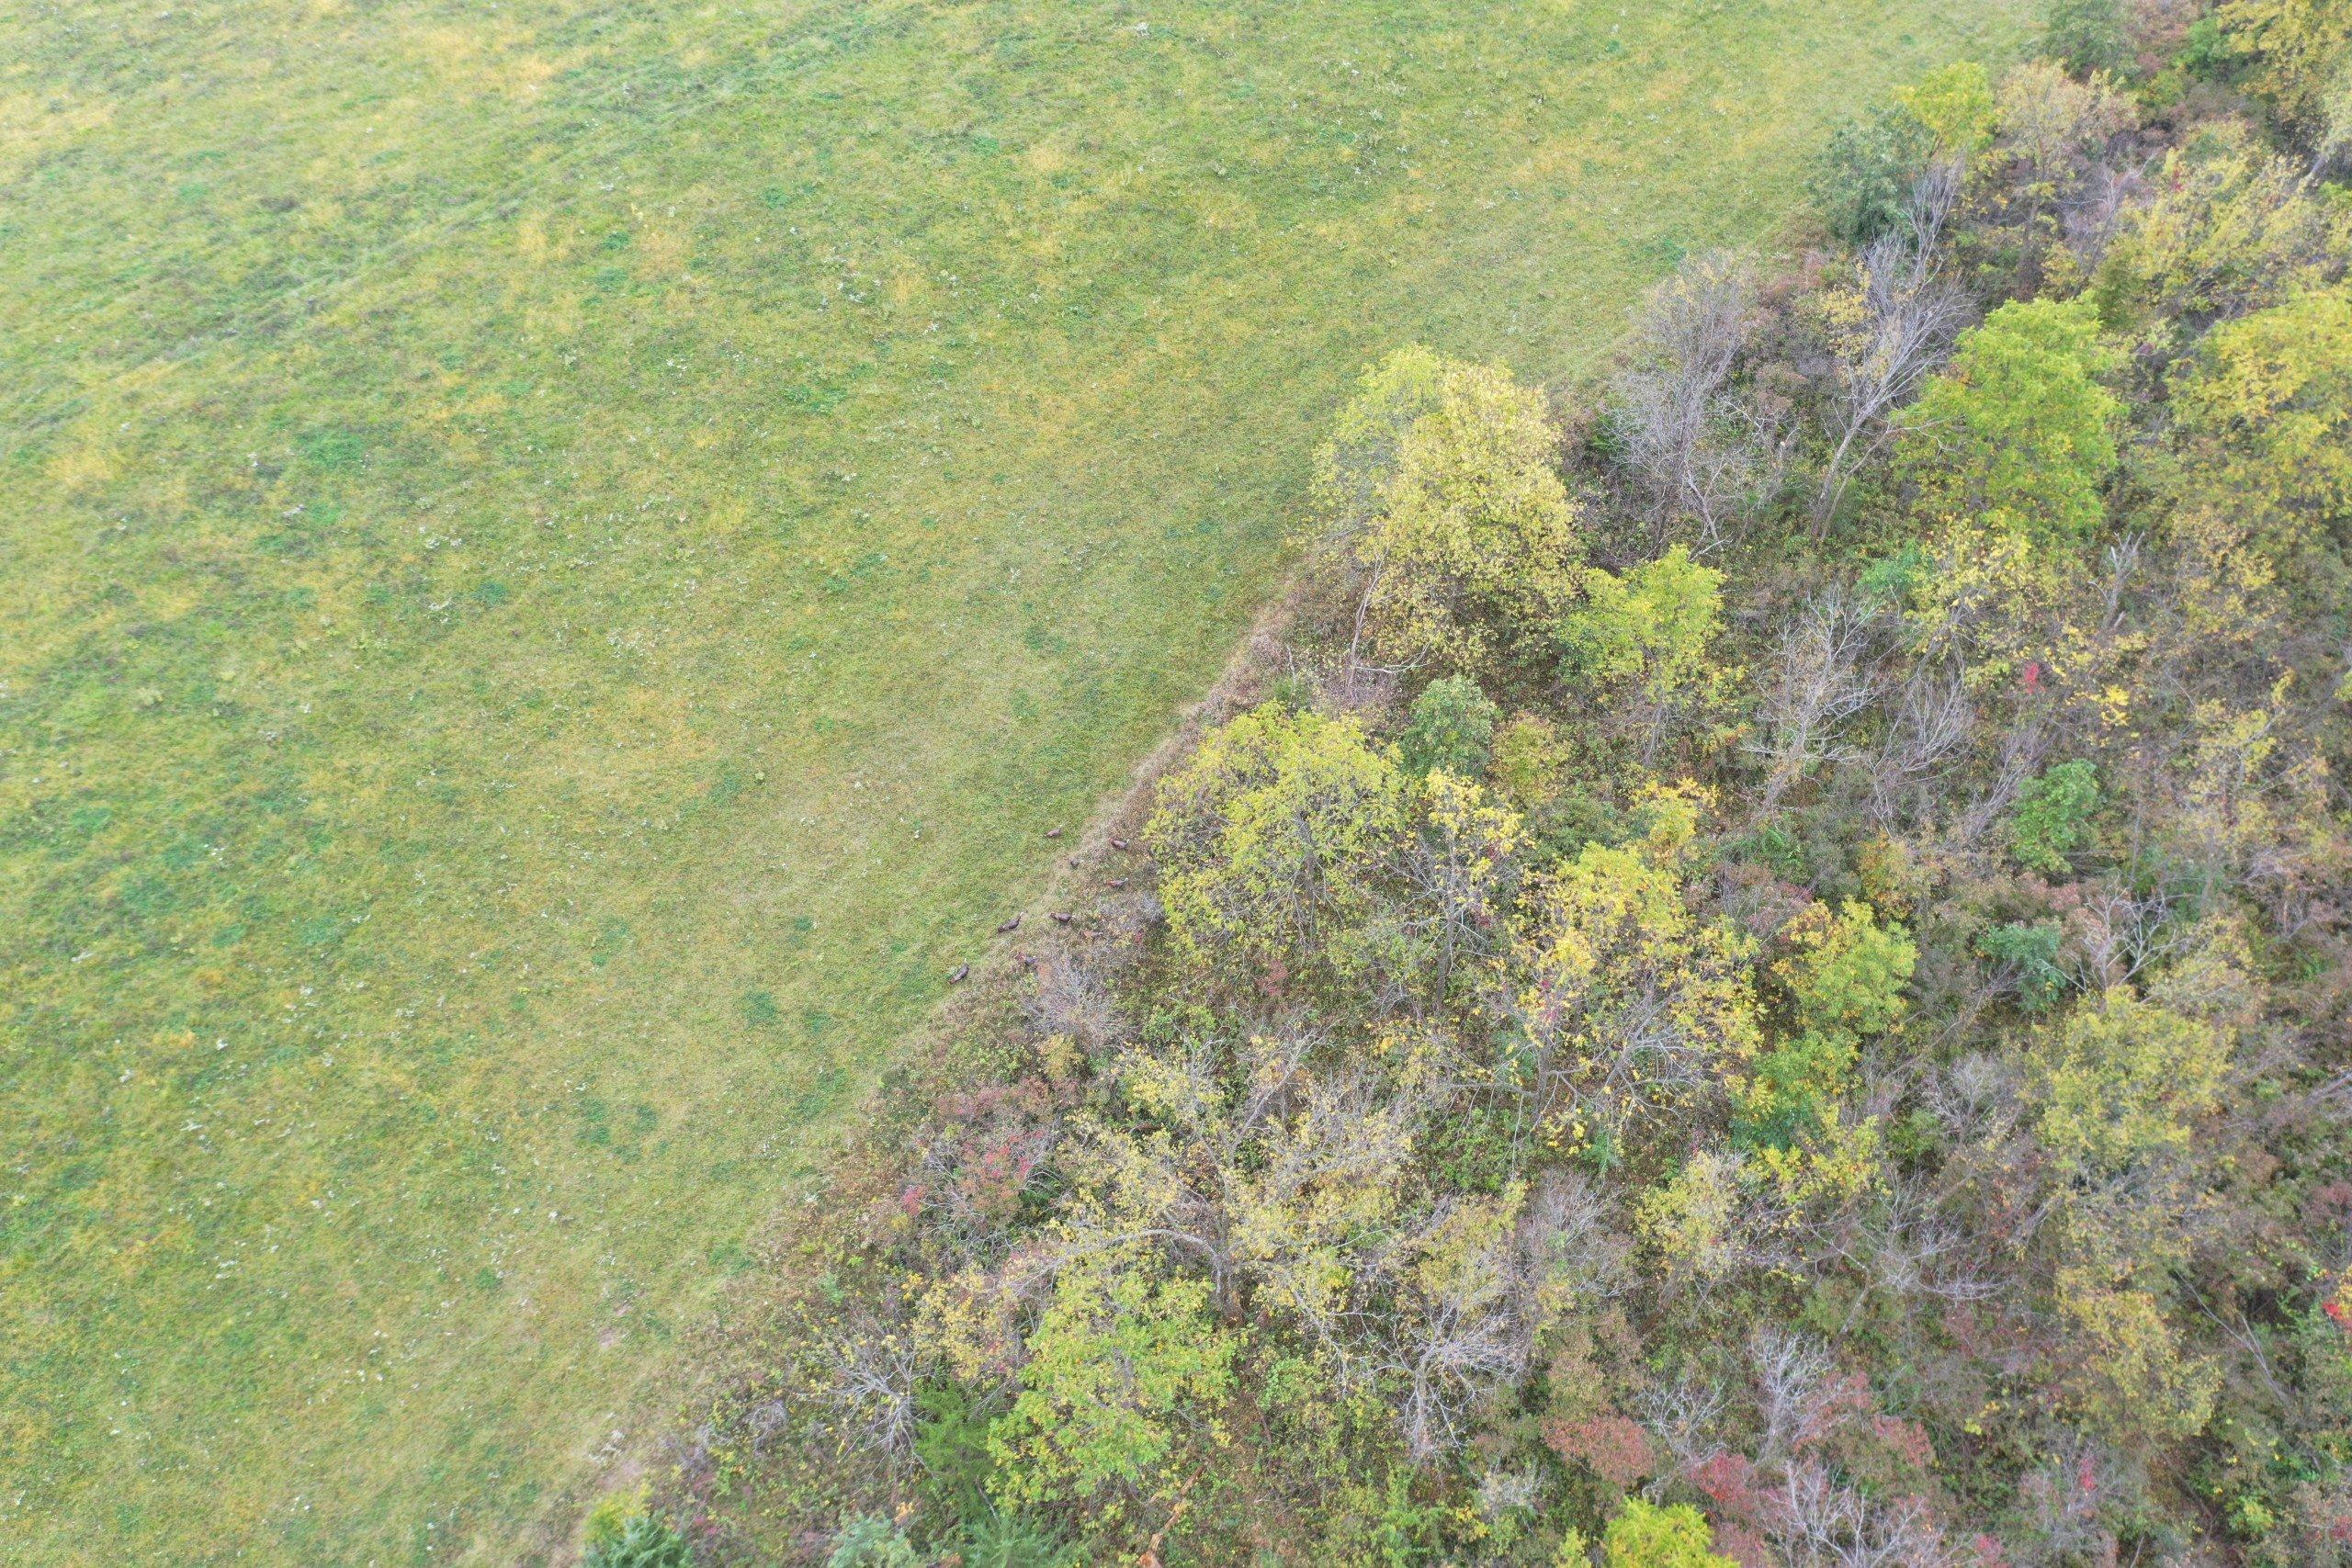 land-warren-county-iowa-200-acres-listing-number-15810-DJI_0599-4.jpg